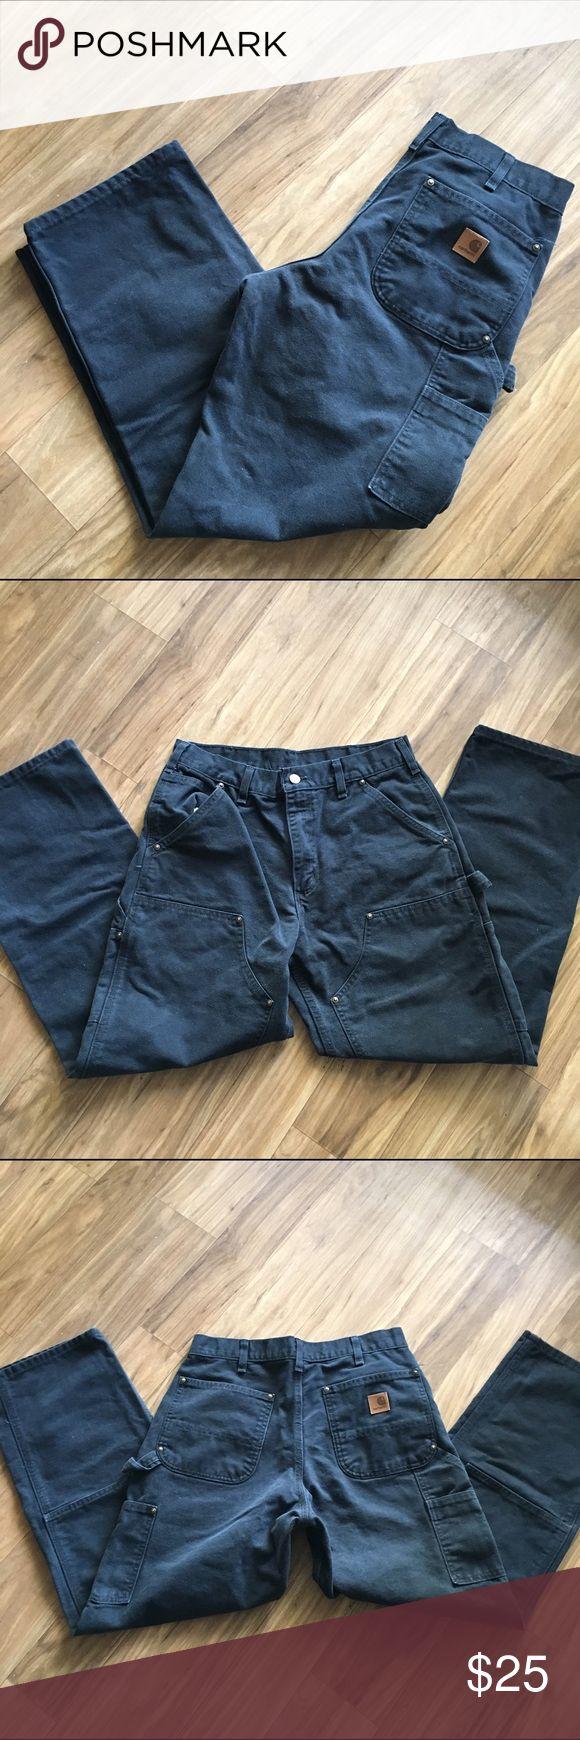 Carhartt work pants Faded black. Original dungaree fit. No holes. Carhartt Jeans